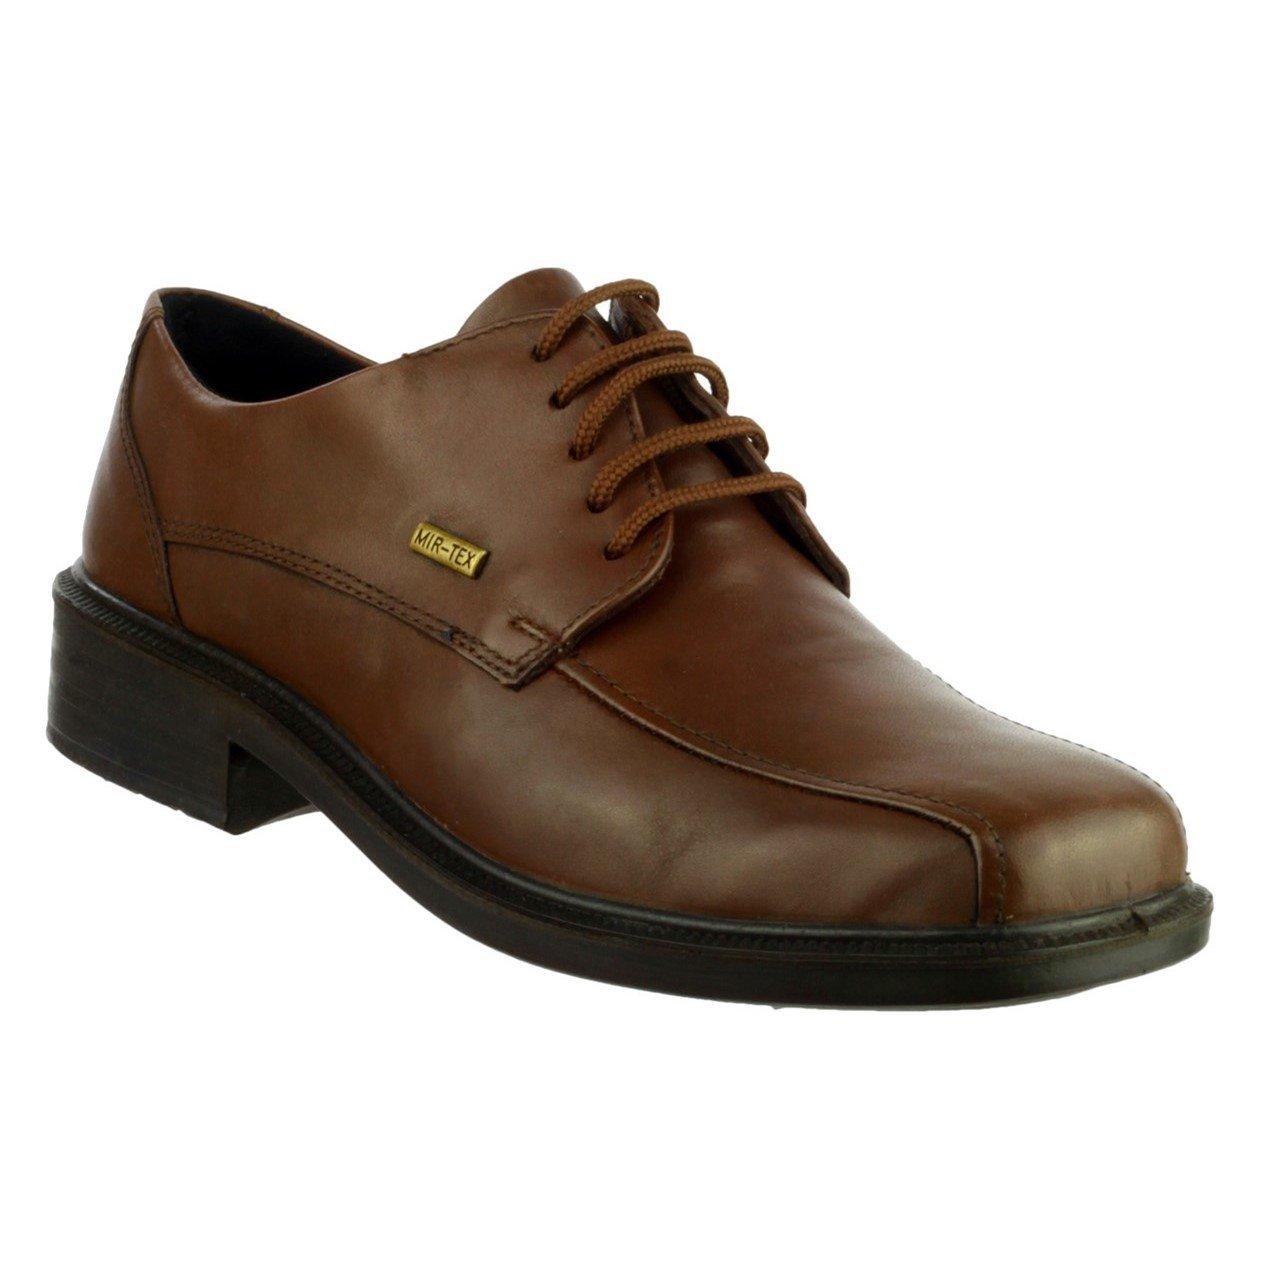 Cotswold Men's Stonehouse Waterproof Shoe Various Colours 32971 - Brown 11